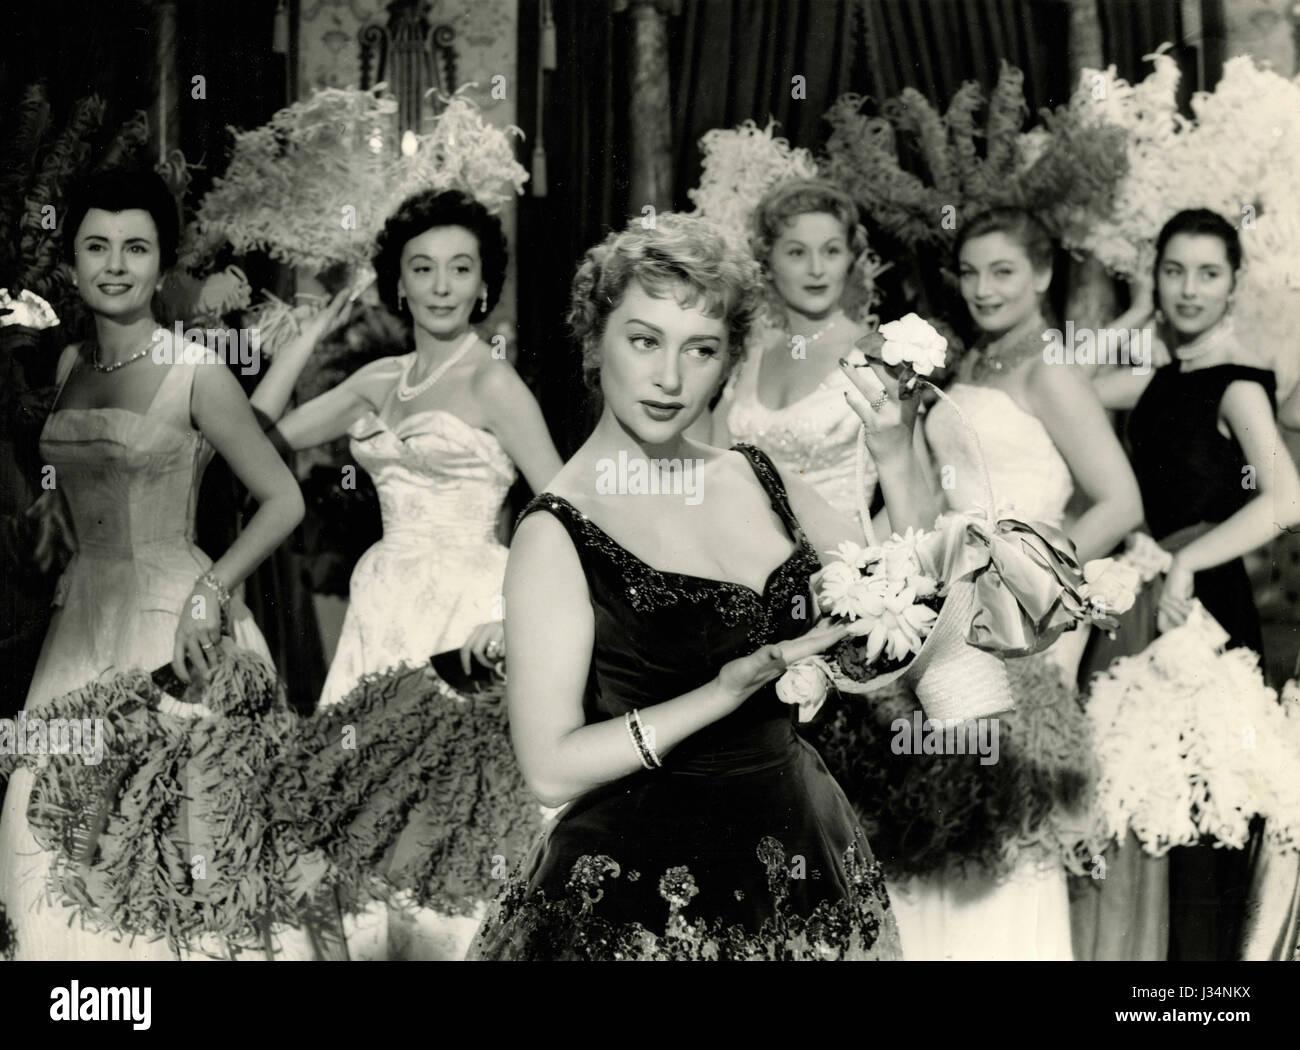 French actress Martine Carol in the movie 'Difendo il mio amore', Italy 1956 - Stock Image